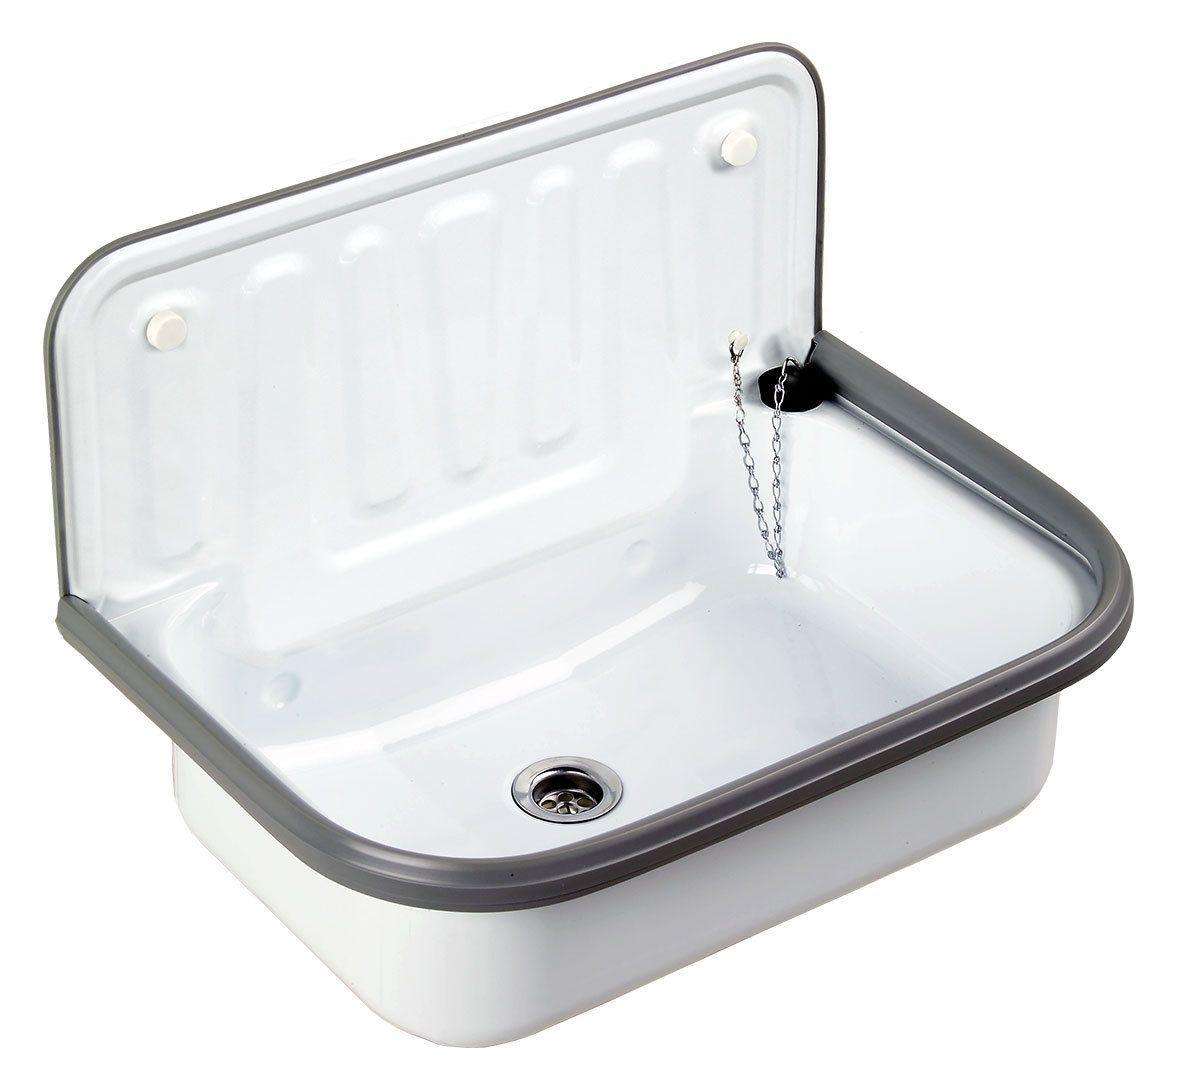 Ausgussbecken Stahl Emailliert Weiss Fur Keller Garten Waschkuche Ebay Ausgussbecken Ausguss Waschbecken